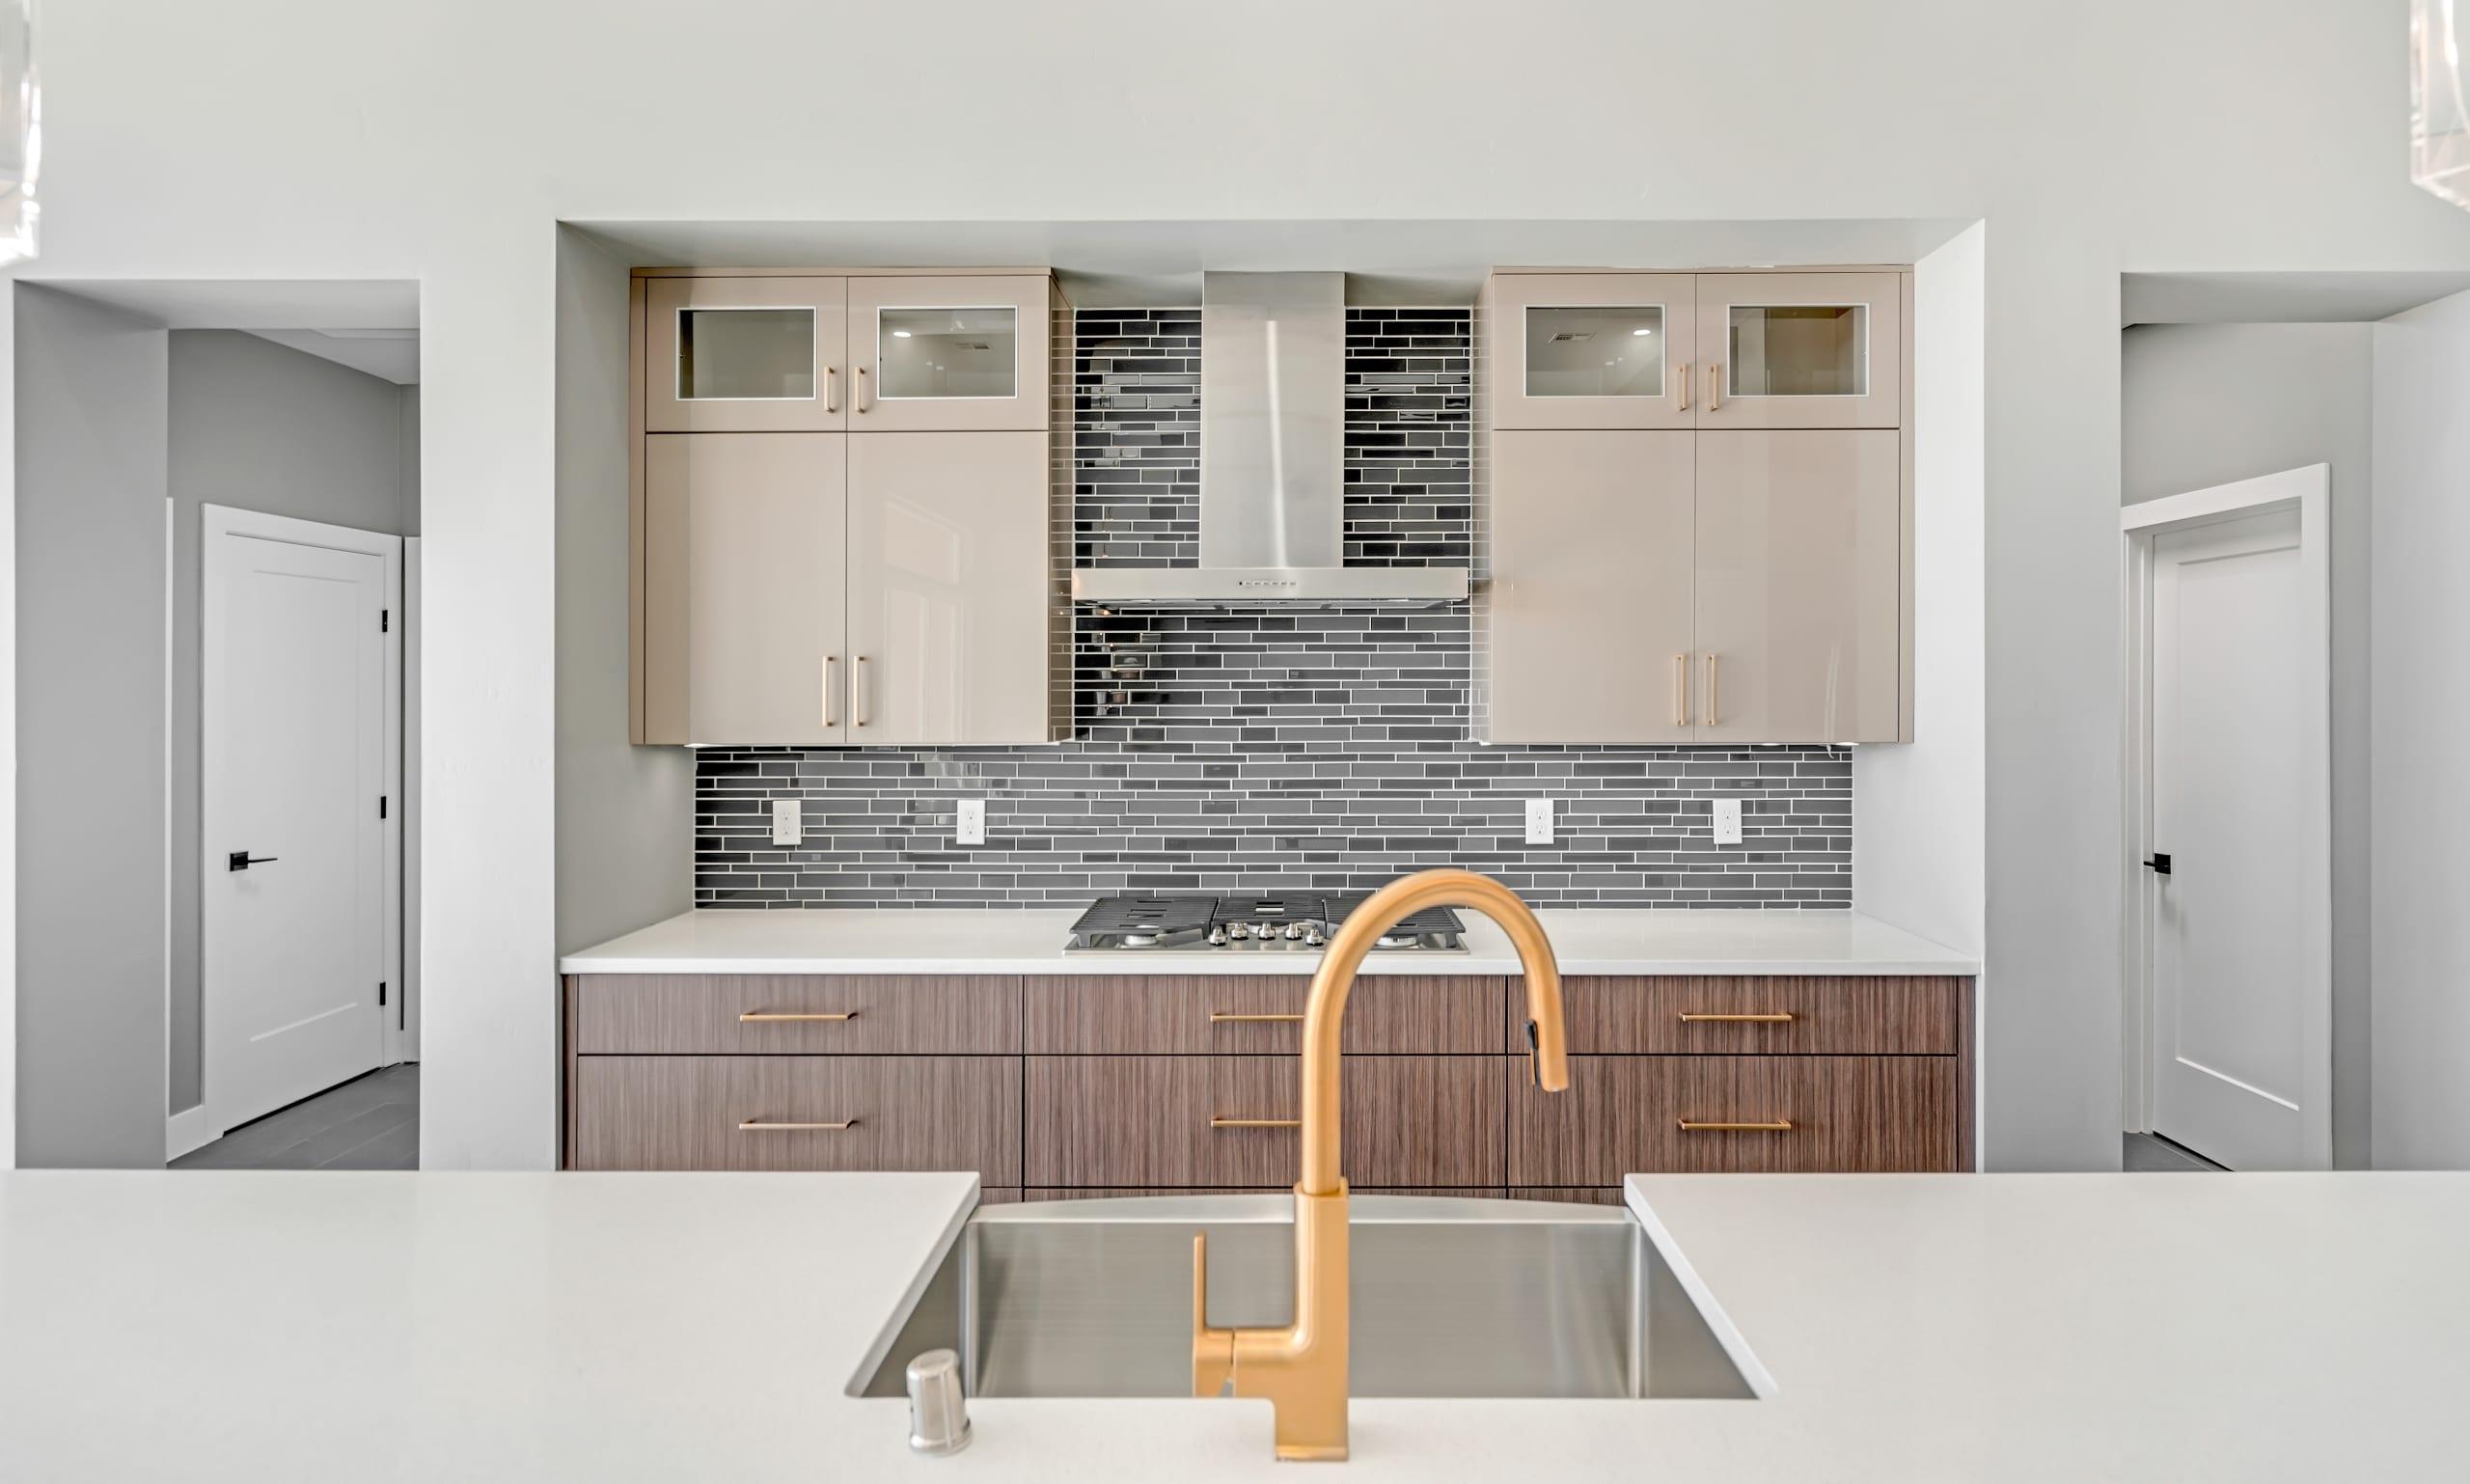 2914 East Springs - Kitchen Sink - Faucet - Range - Cabinents